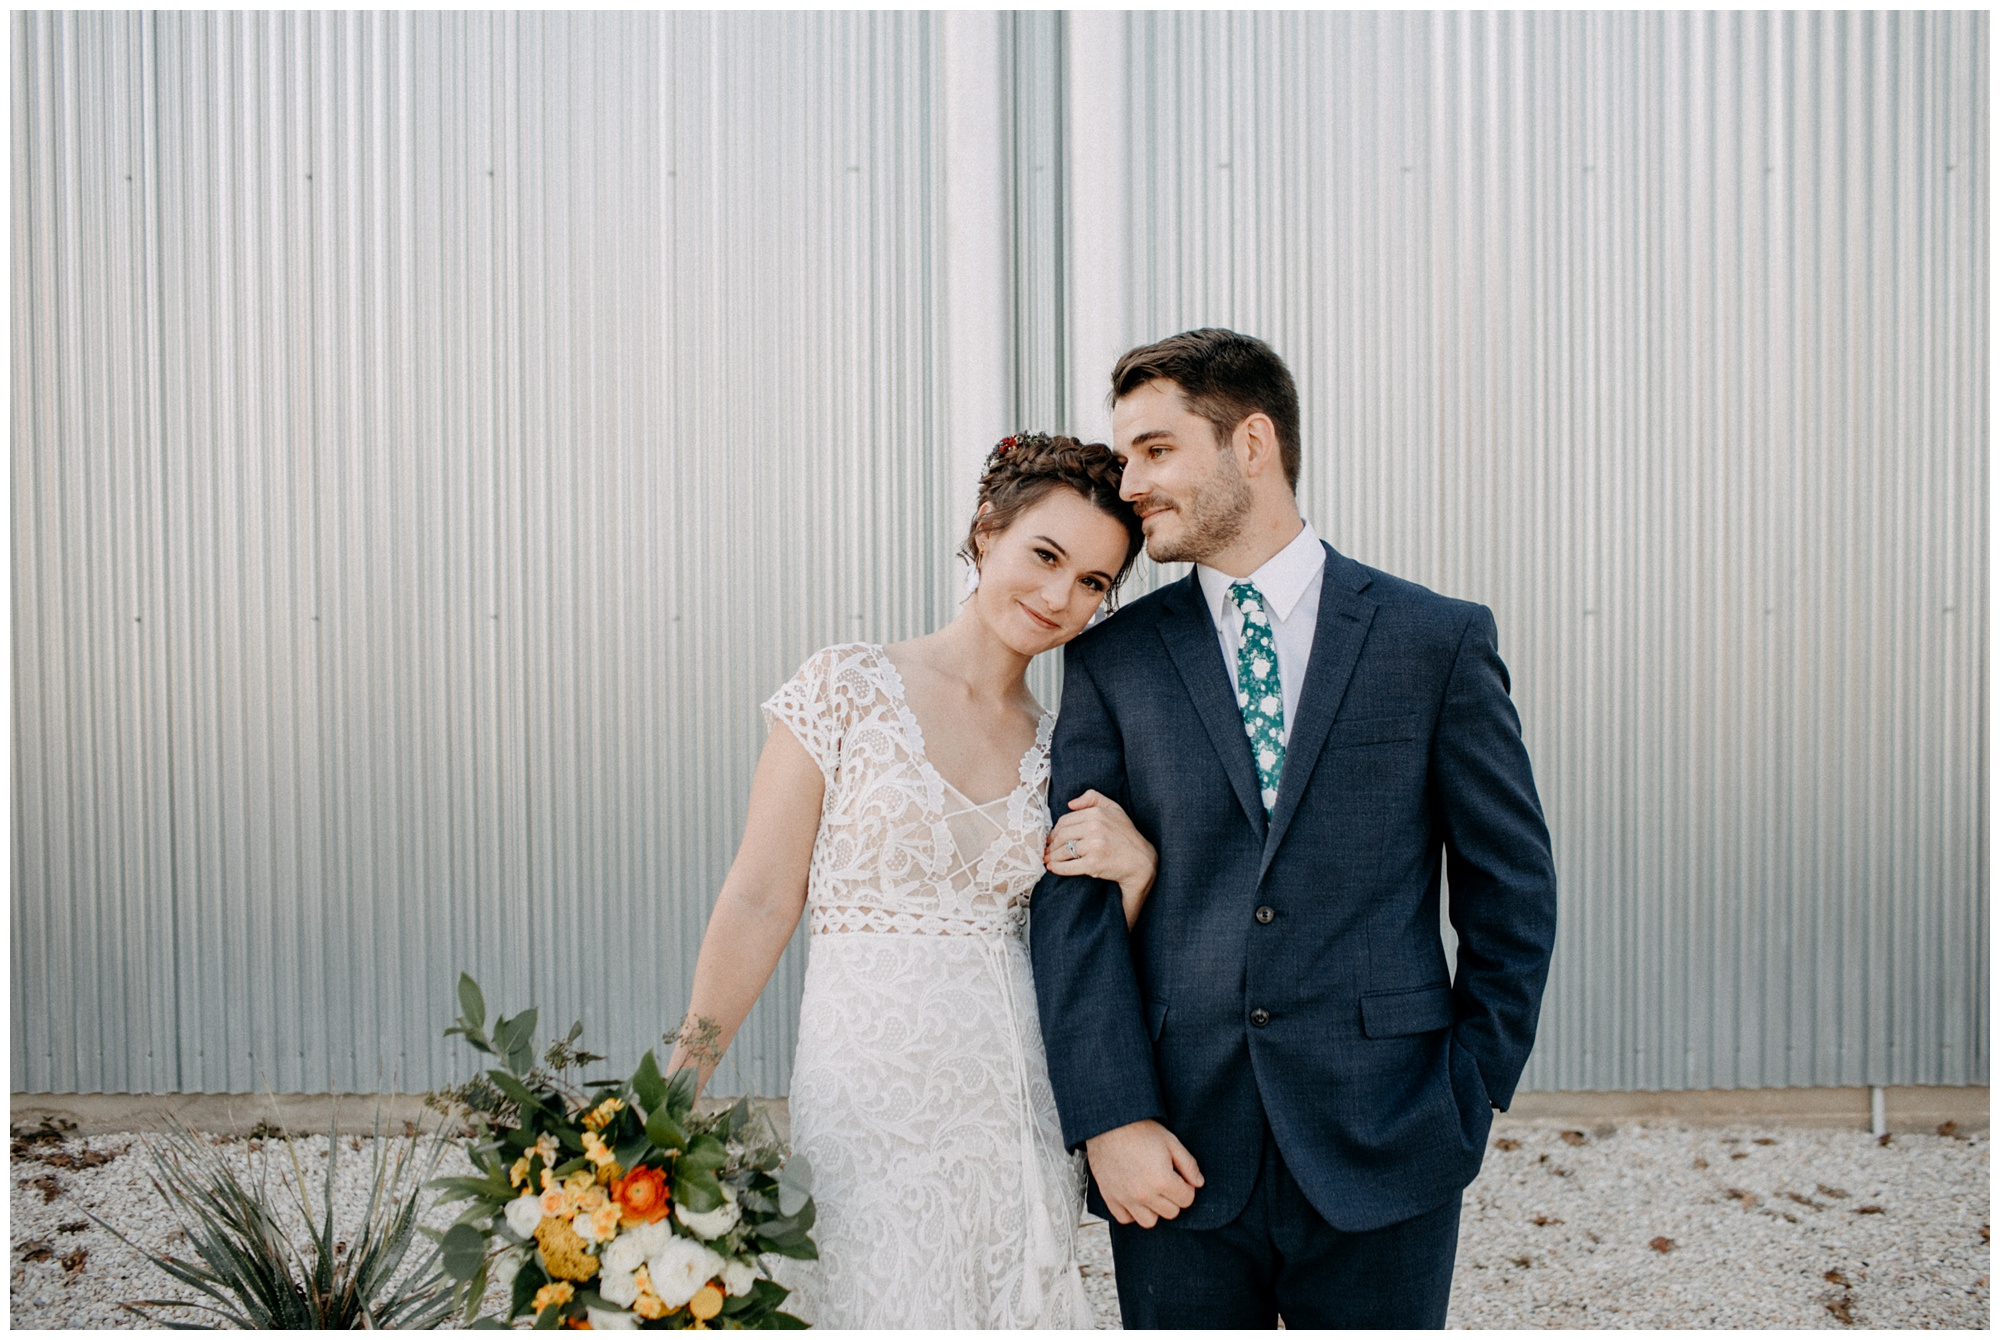 AUSTIN-TEXAS-PROSPECT-HOUSE-WEDDING-VENUE-PHOTOGRAPHY25801.JPG